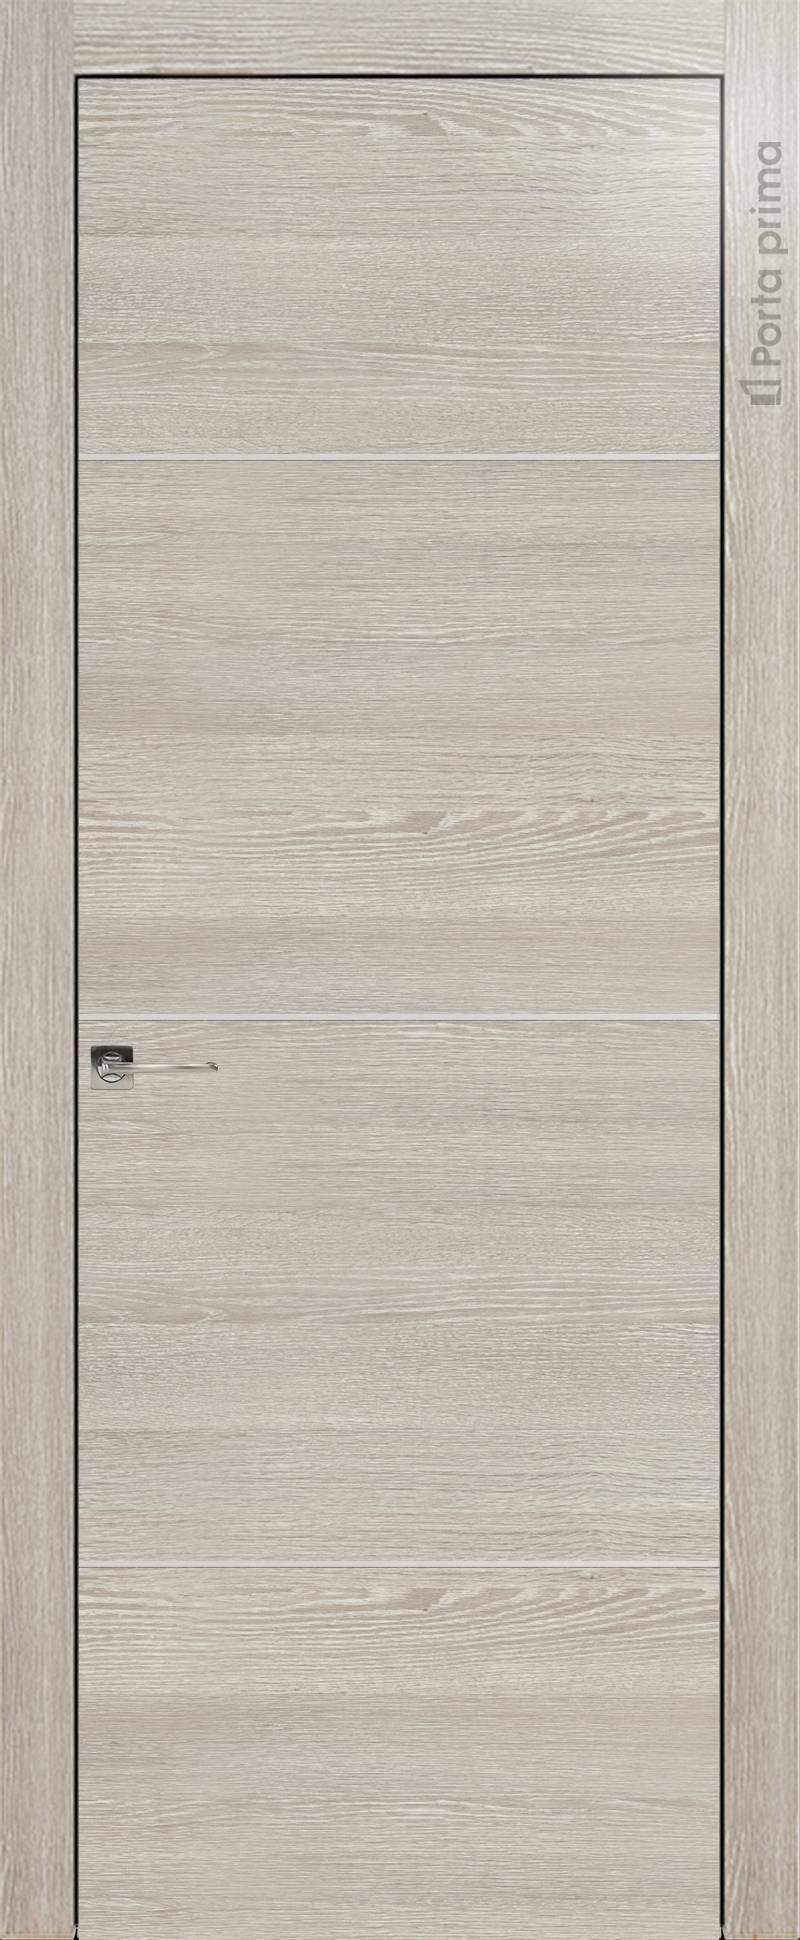 Tivoli Г-3 цвет - Серый дуб Без стекла (ДГ)